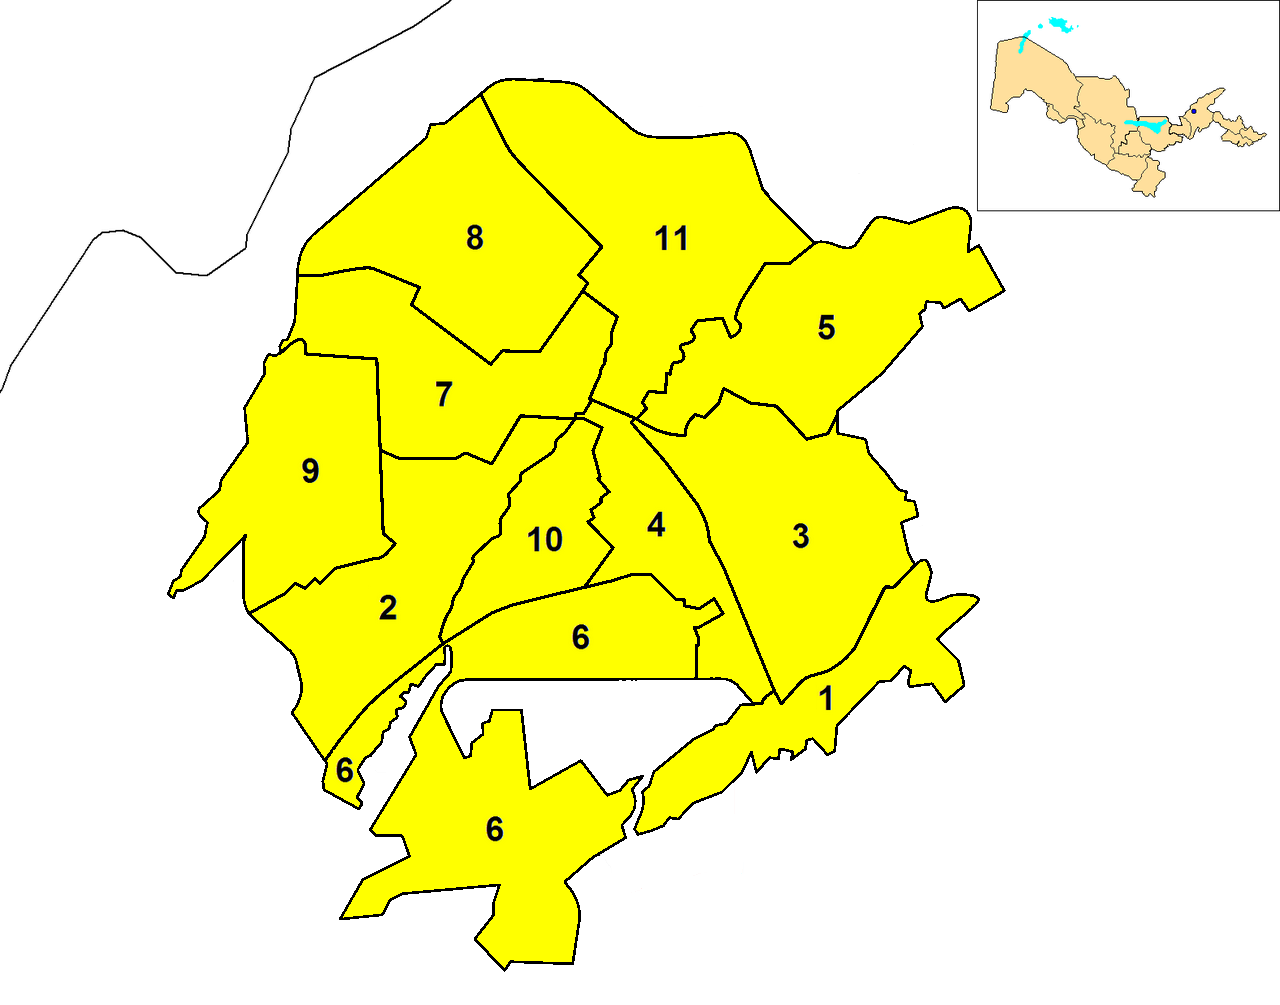 FileTashkent City districtspng Wikimedia Commons